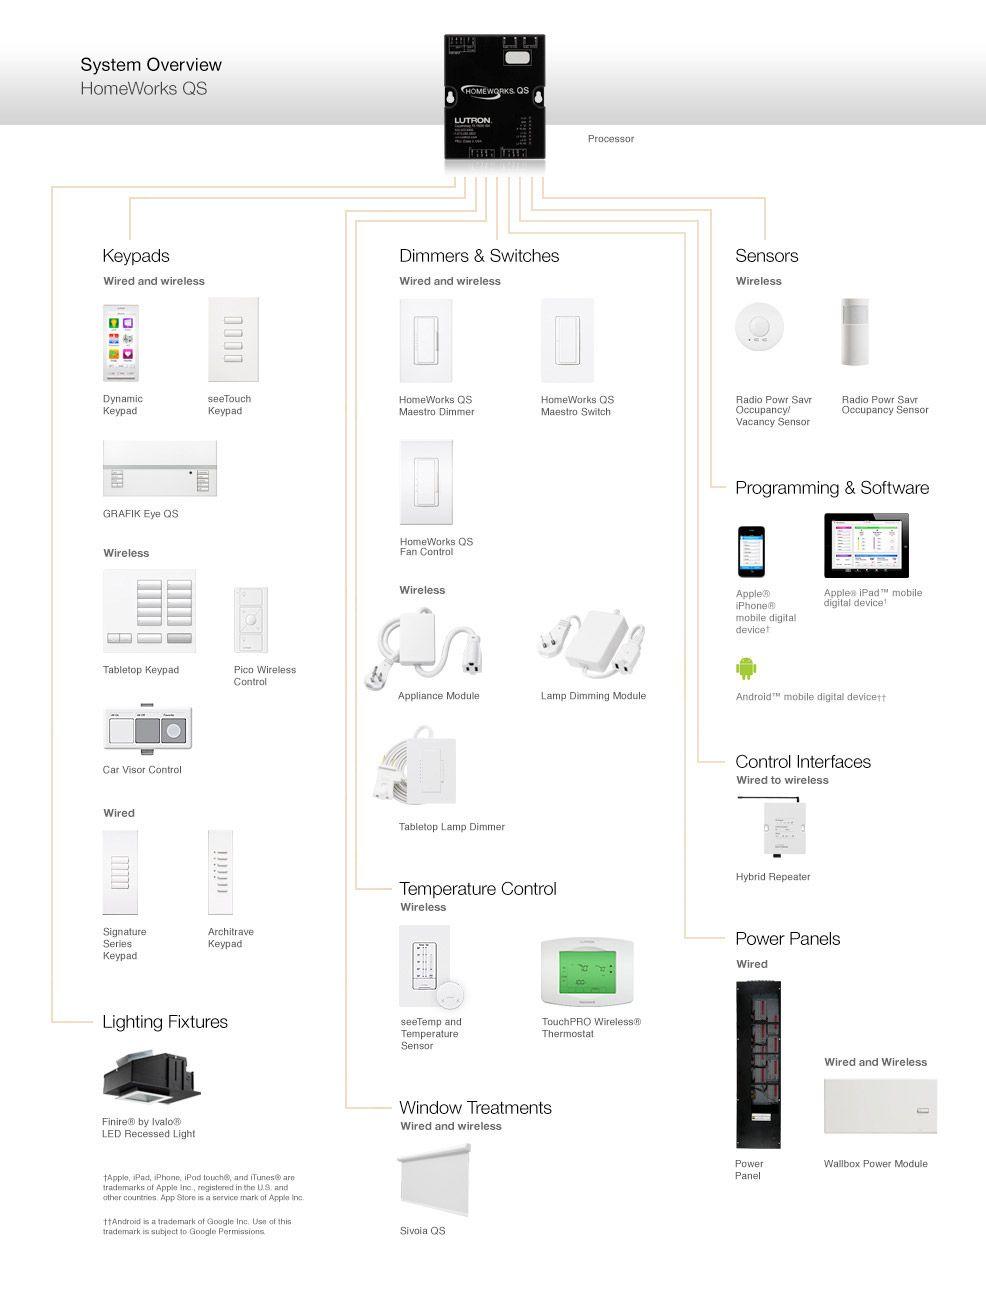 Lutron HomeWorks QS Complete home lighting, audio-visual